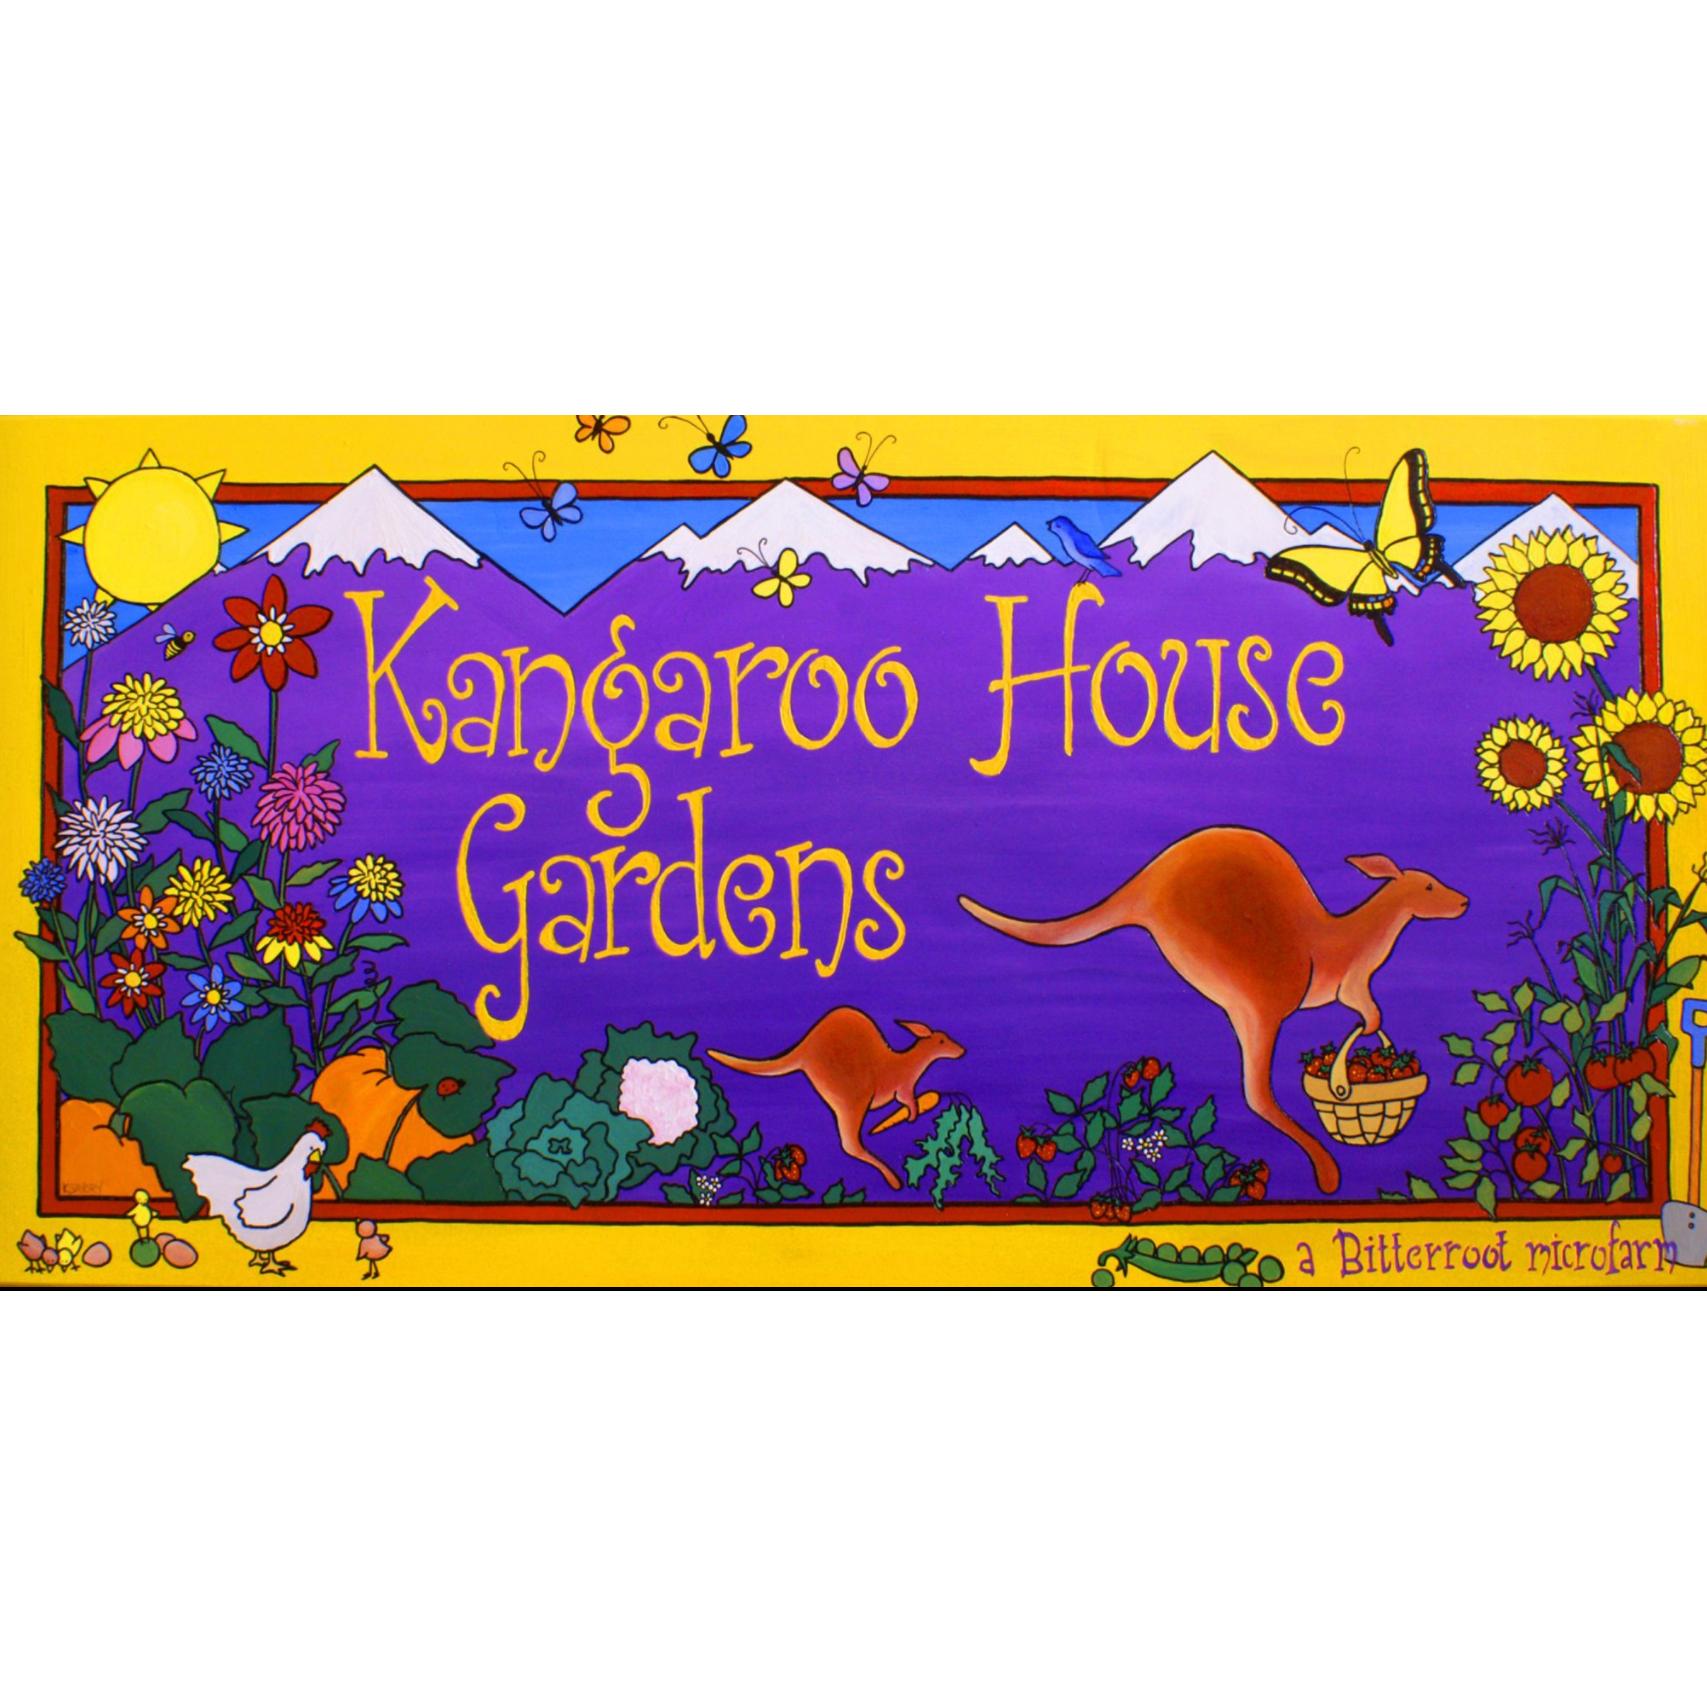 Kangaroo House Gardens